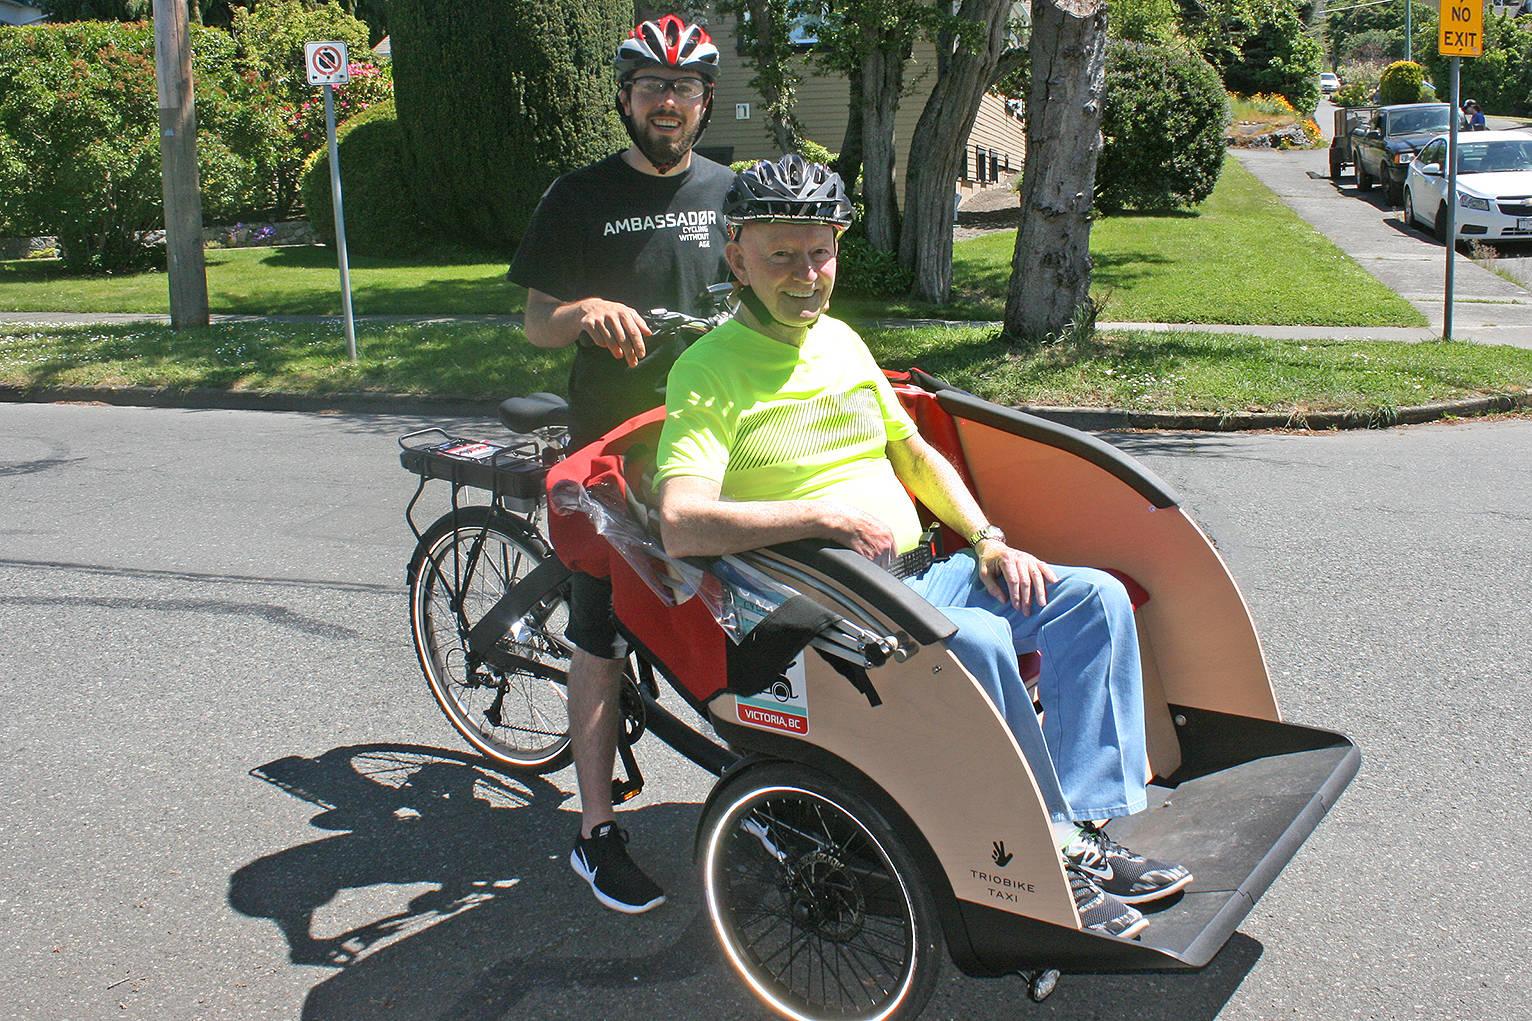 9548221_web1_copy_CyclingWIthoutAge.jpg